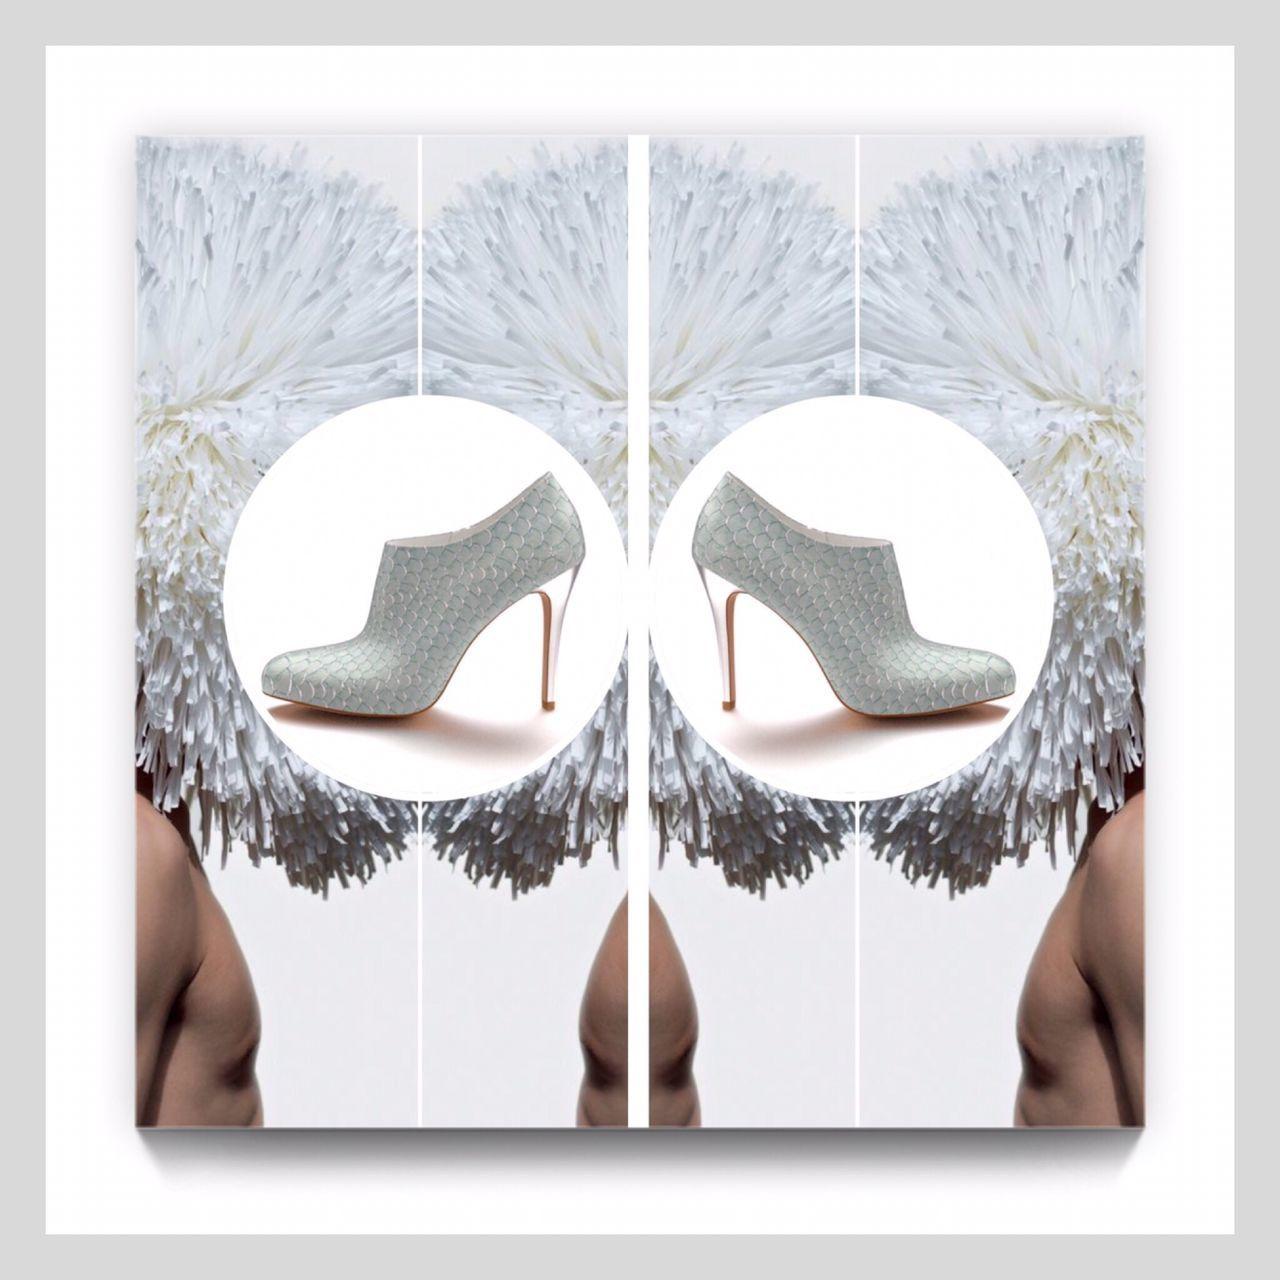 Fashion Photography Fashion Design Fashion Shoe Shoes Designer  Design Day Luxury Digital Composite